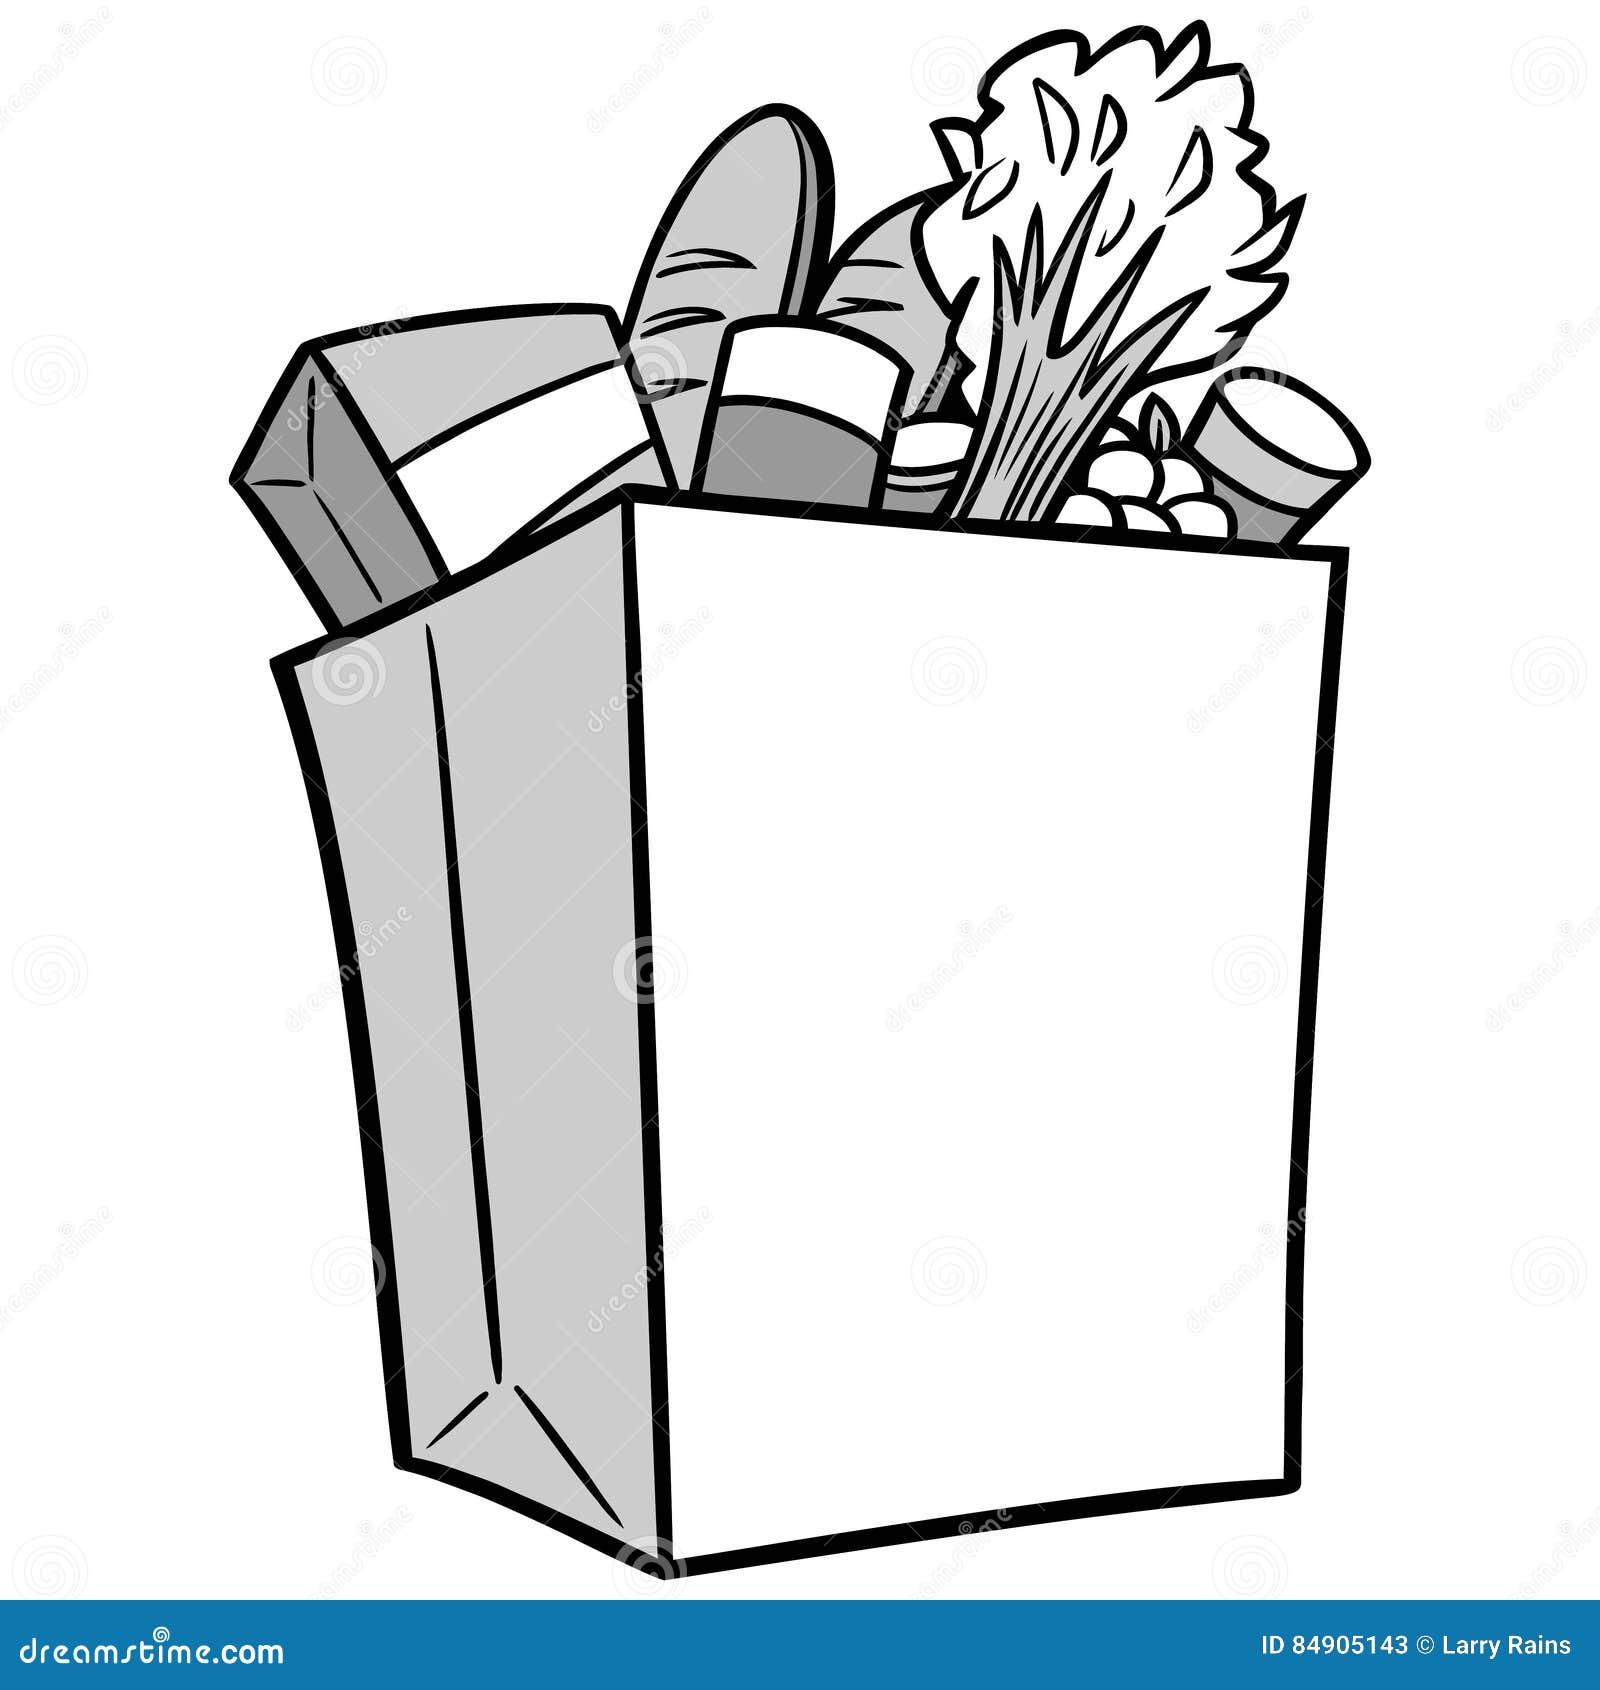 Grocery Bag Illustration stock vector. Illustration of ...